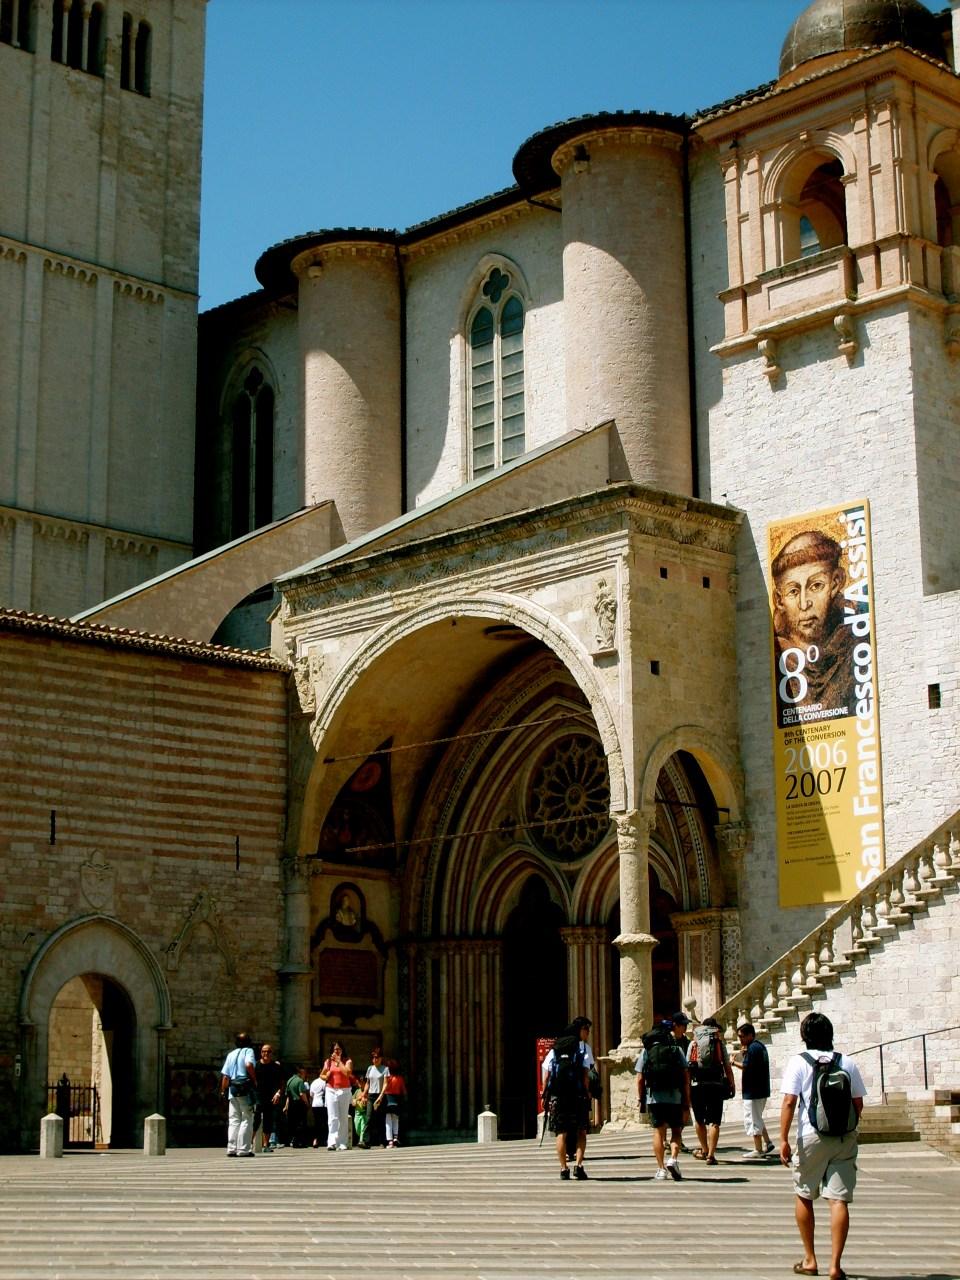 St Frances' Basilica